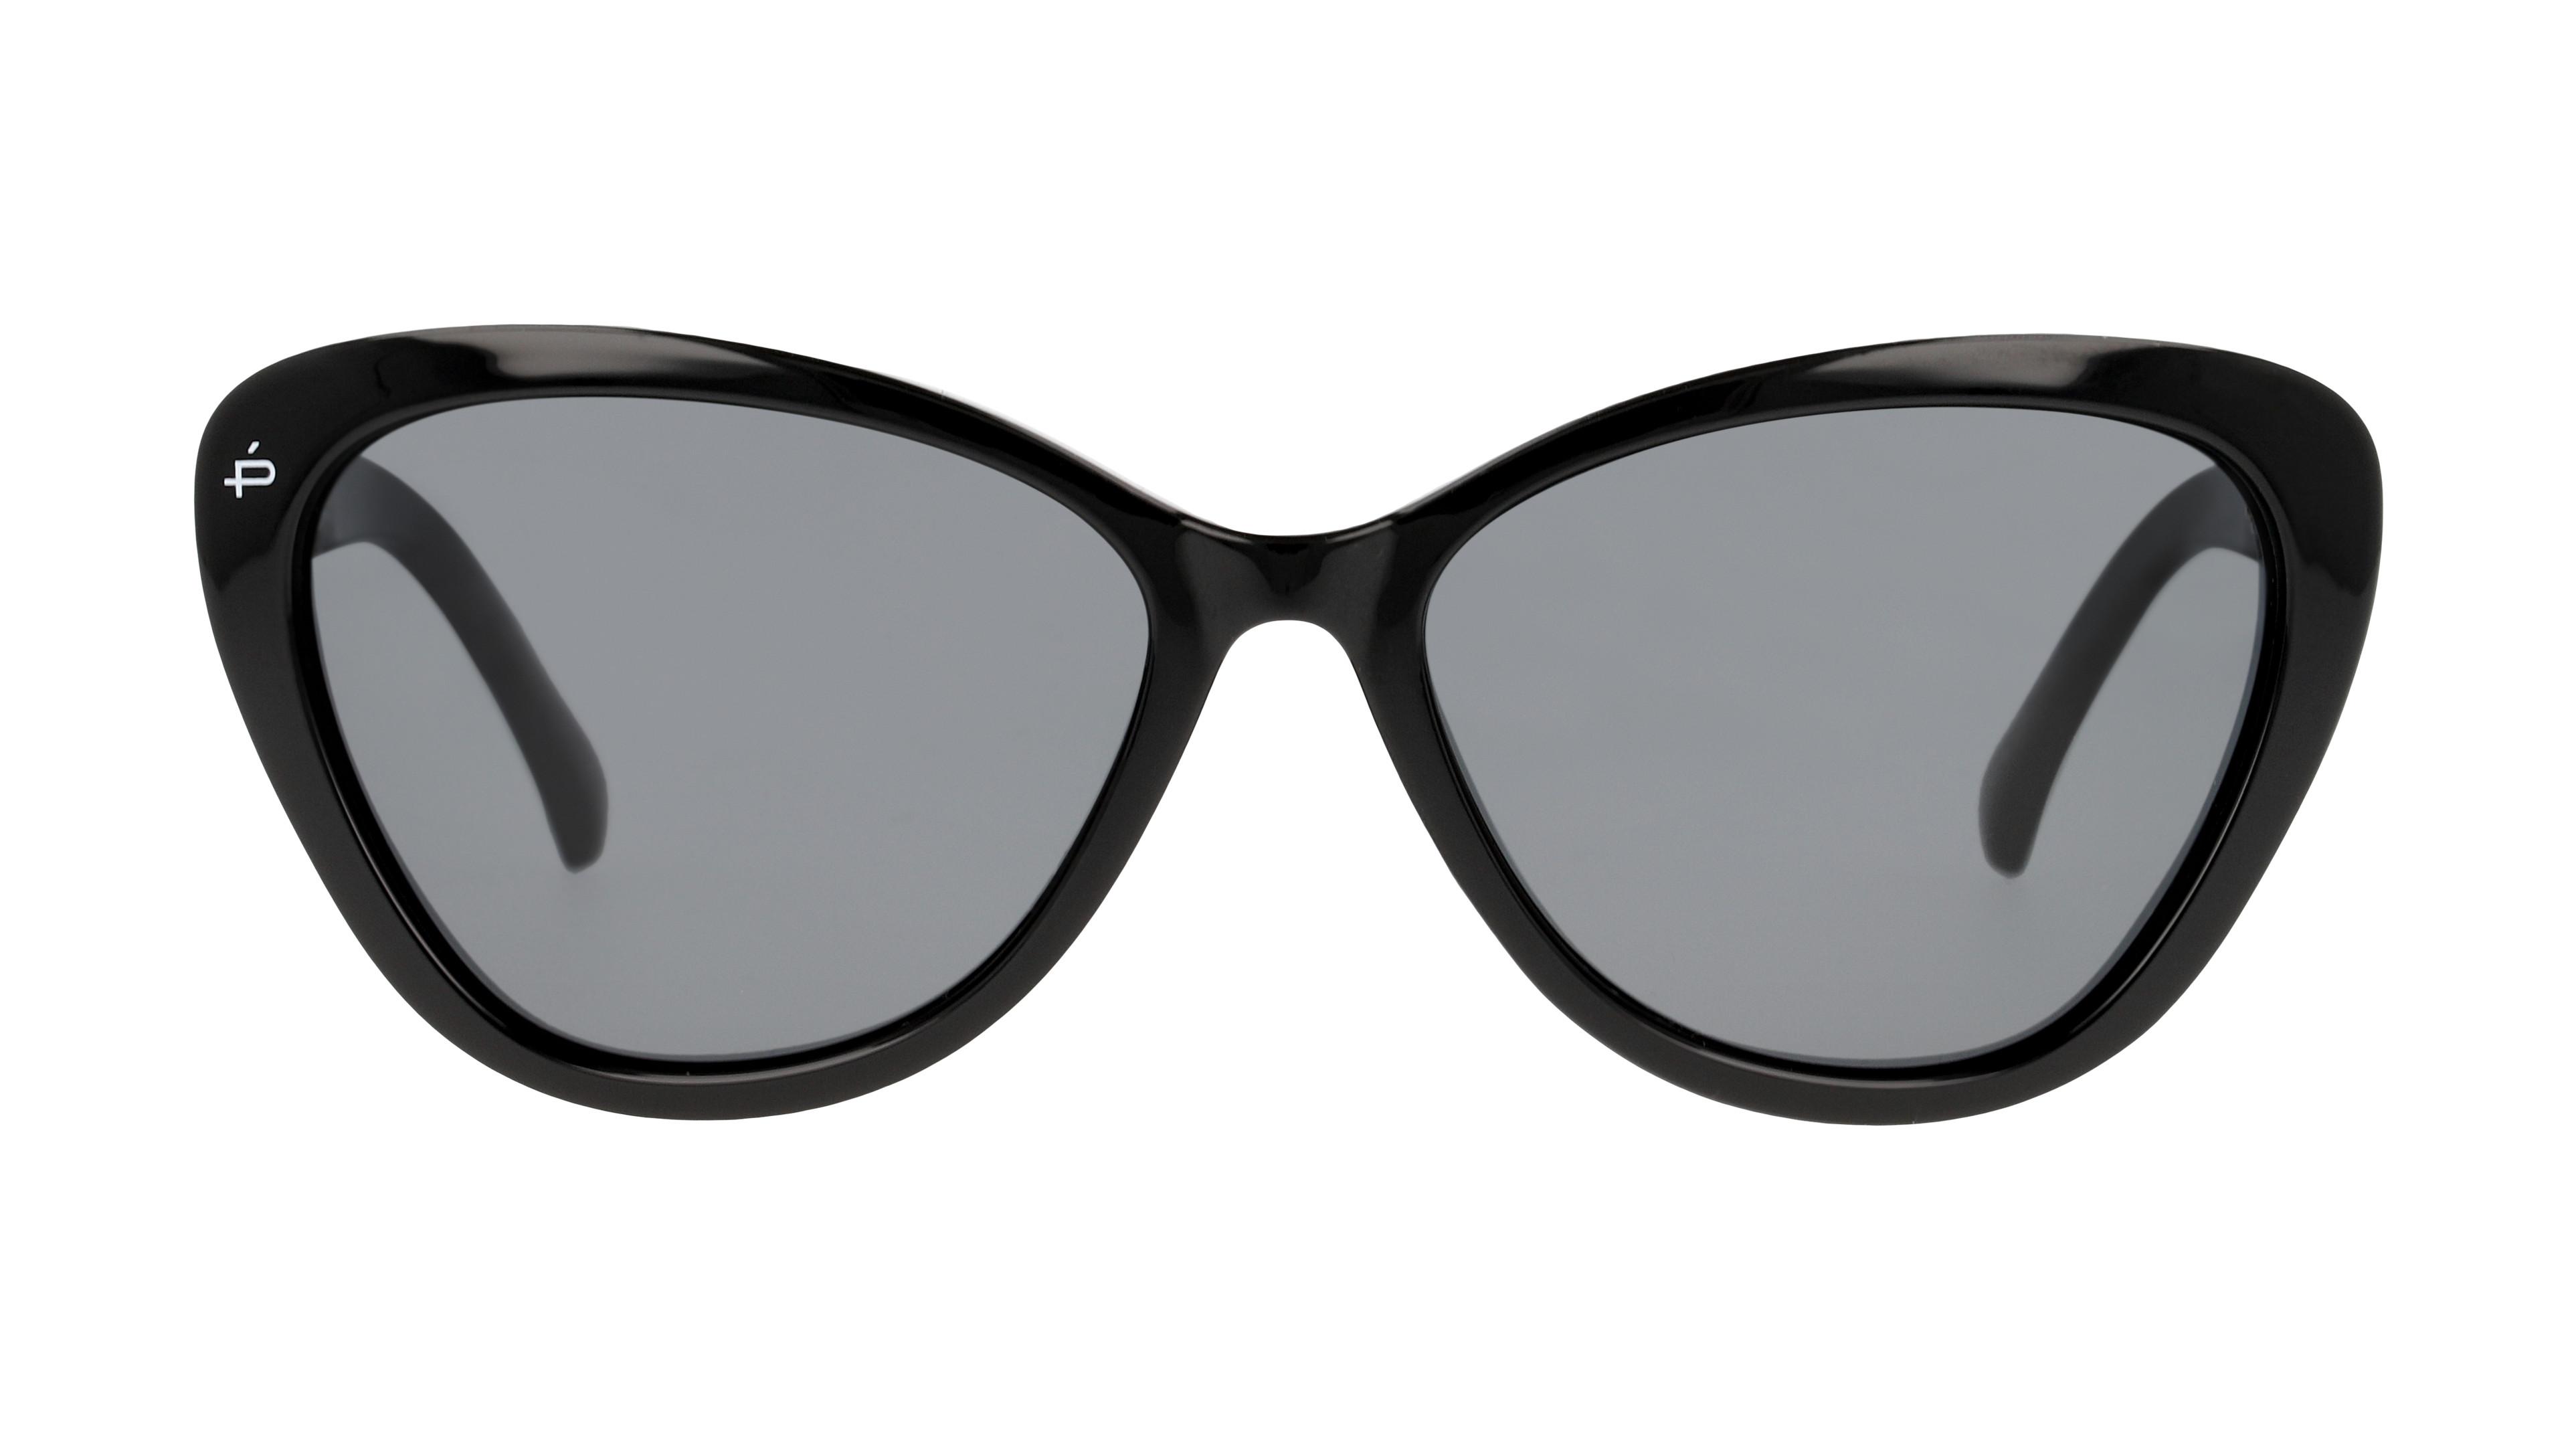 0810036102131-front-prive-revaux-sonnenbrille-the_hepburn_2_0-the-hepburn-2-0-black-black